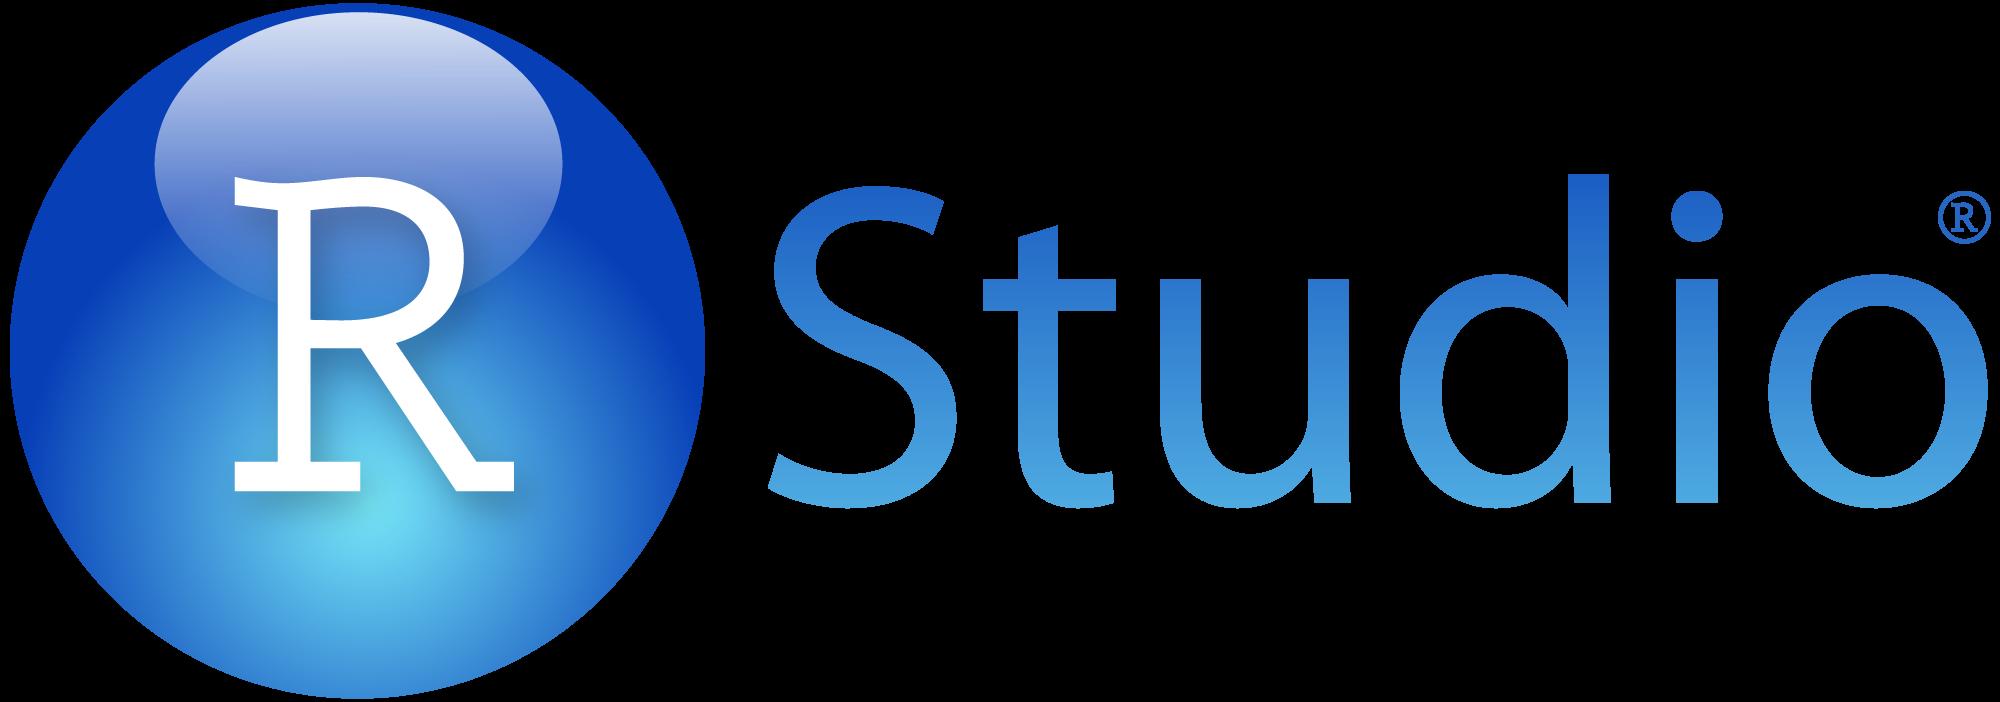 Rstudio1